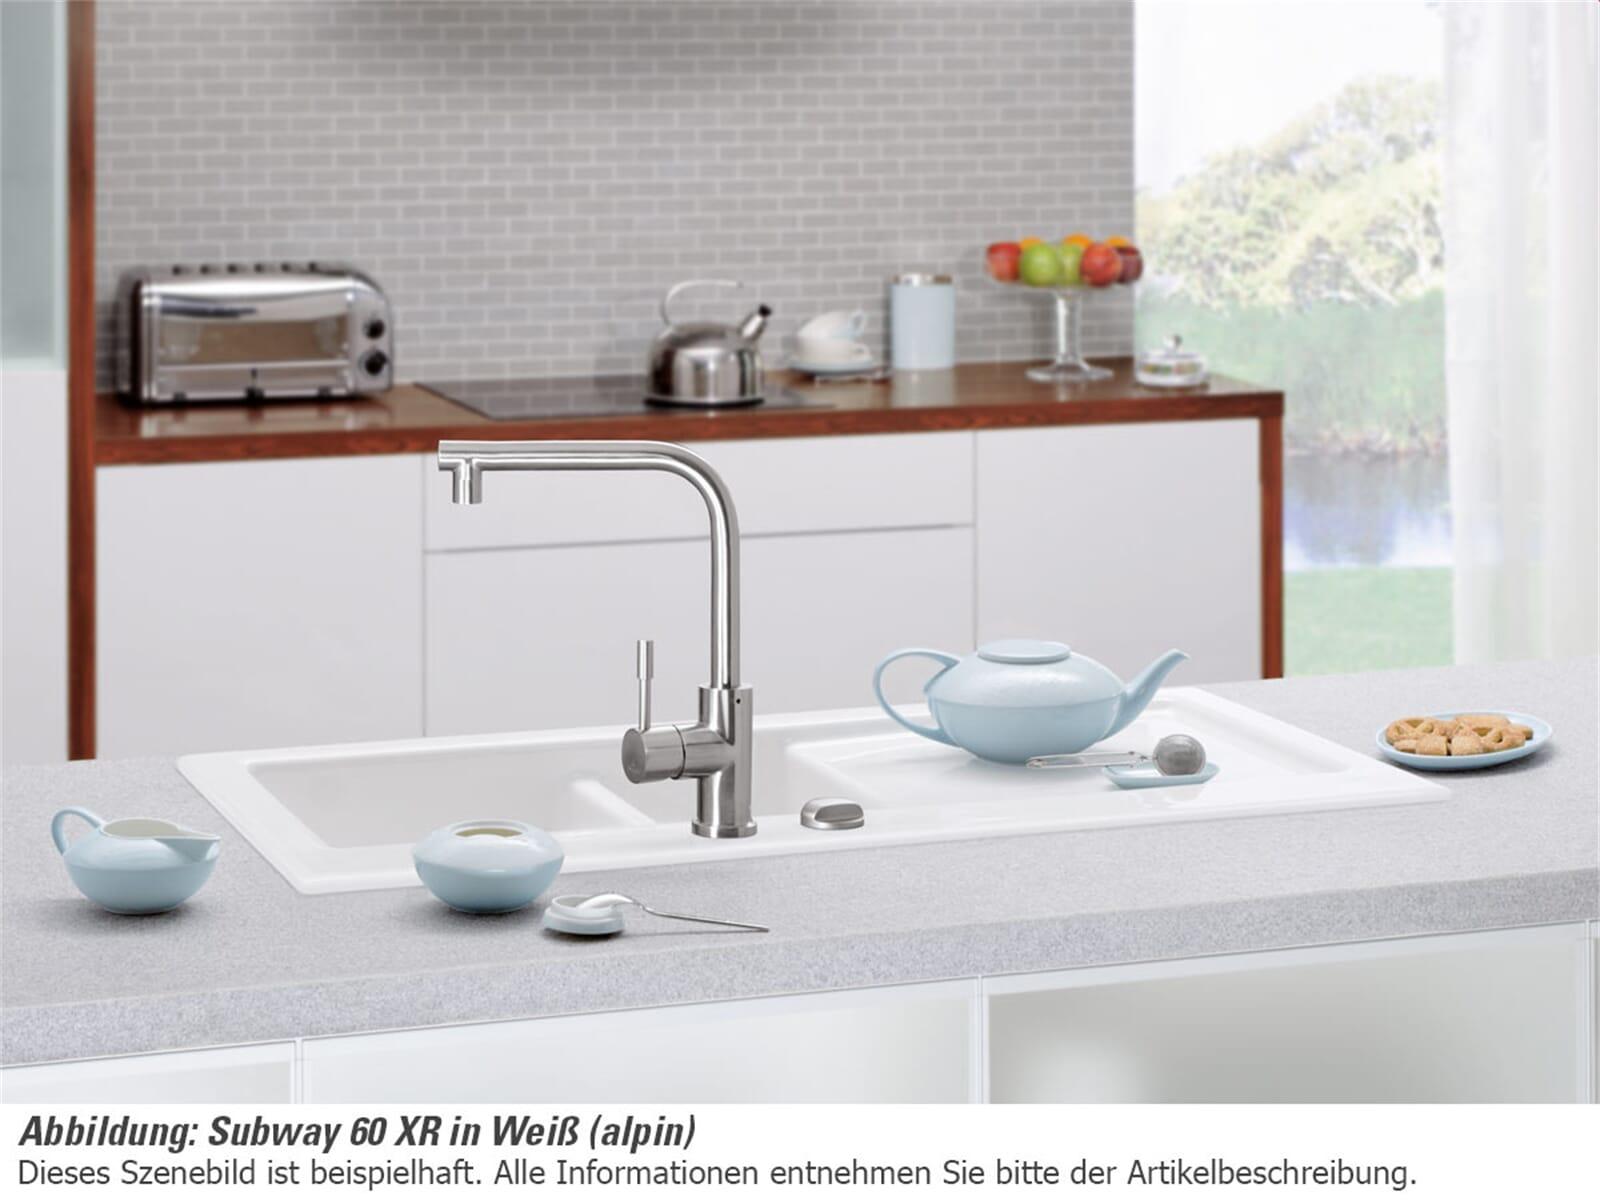 Villeroy & Boch Subway 60 XR Ebony - 6720 02 S5 Keramikspüle Exzenterbetätigung